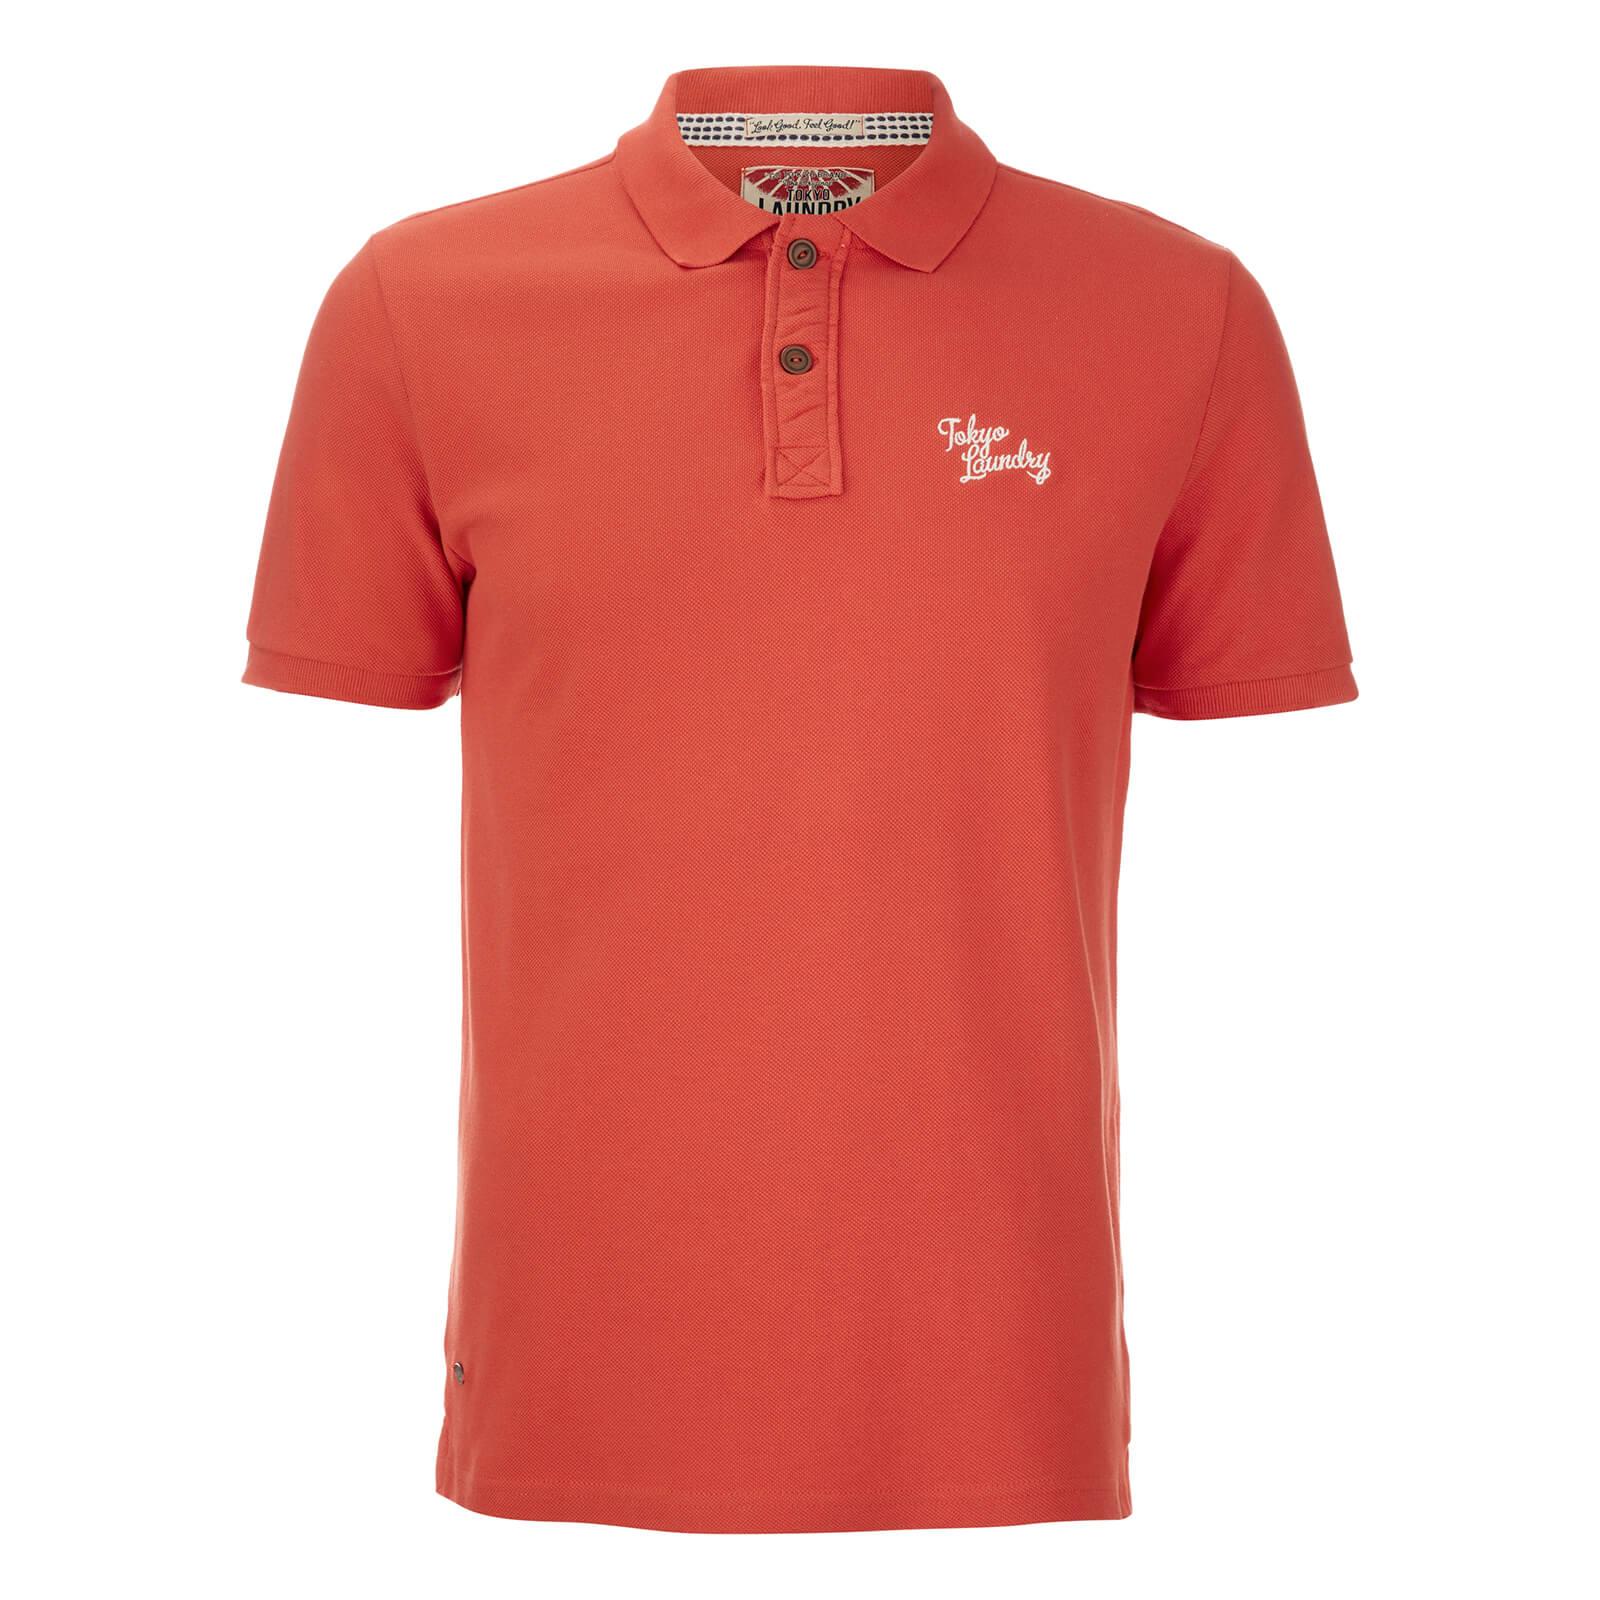 Tokyo Laundry Mens Penn State Polo Shirt Paprika Clothing Zavvi